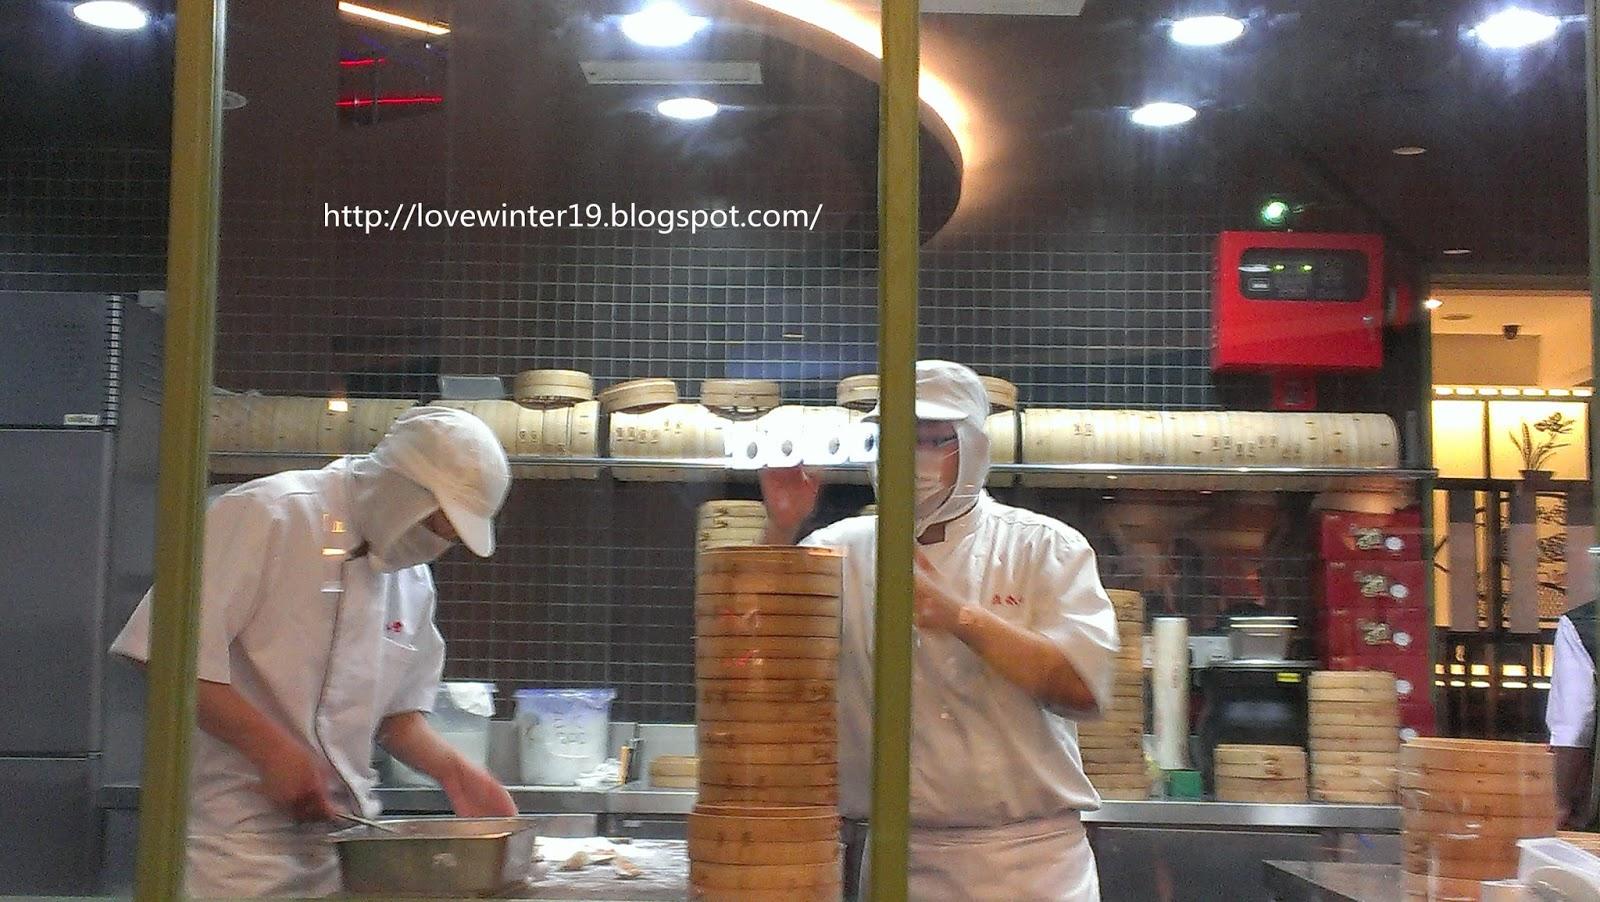 Fung S Kitchen Okc Dim Sum Hours